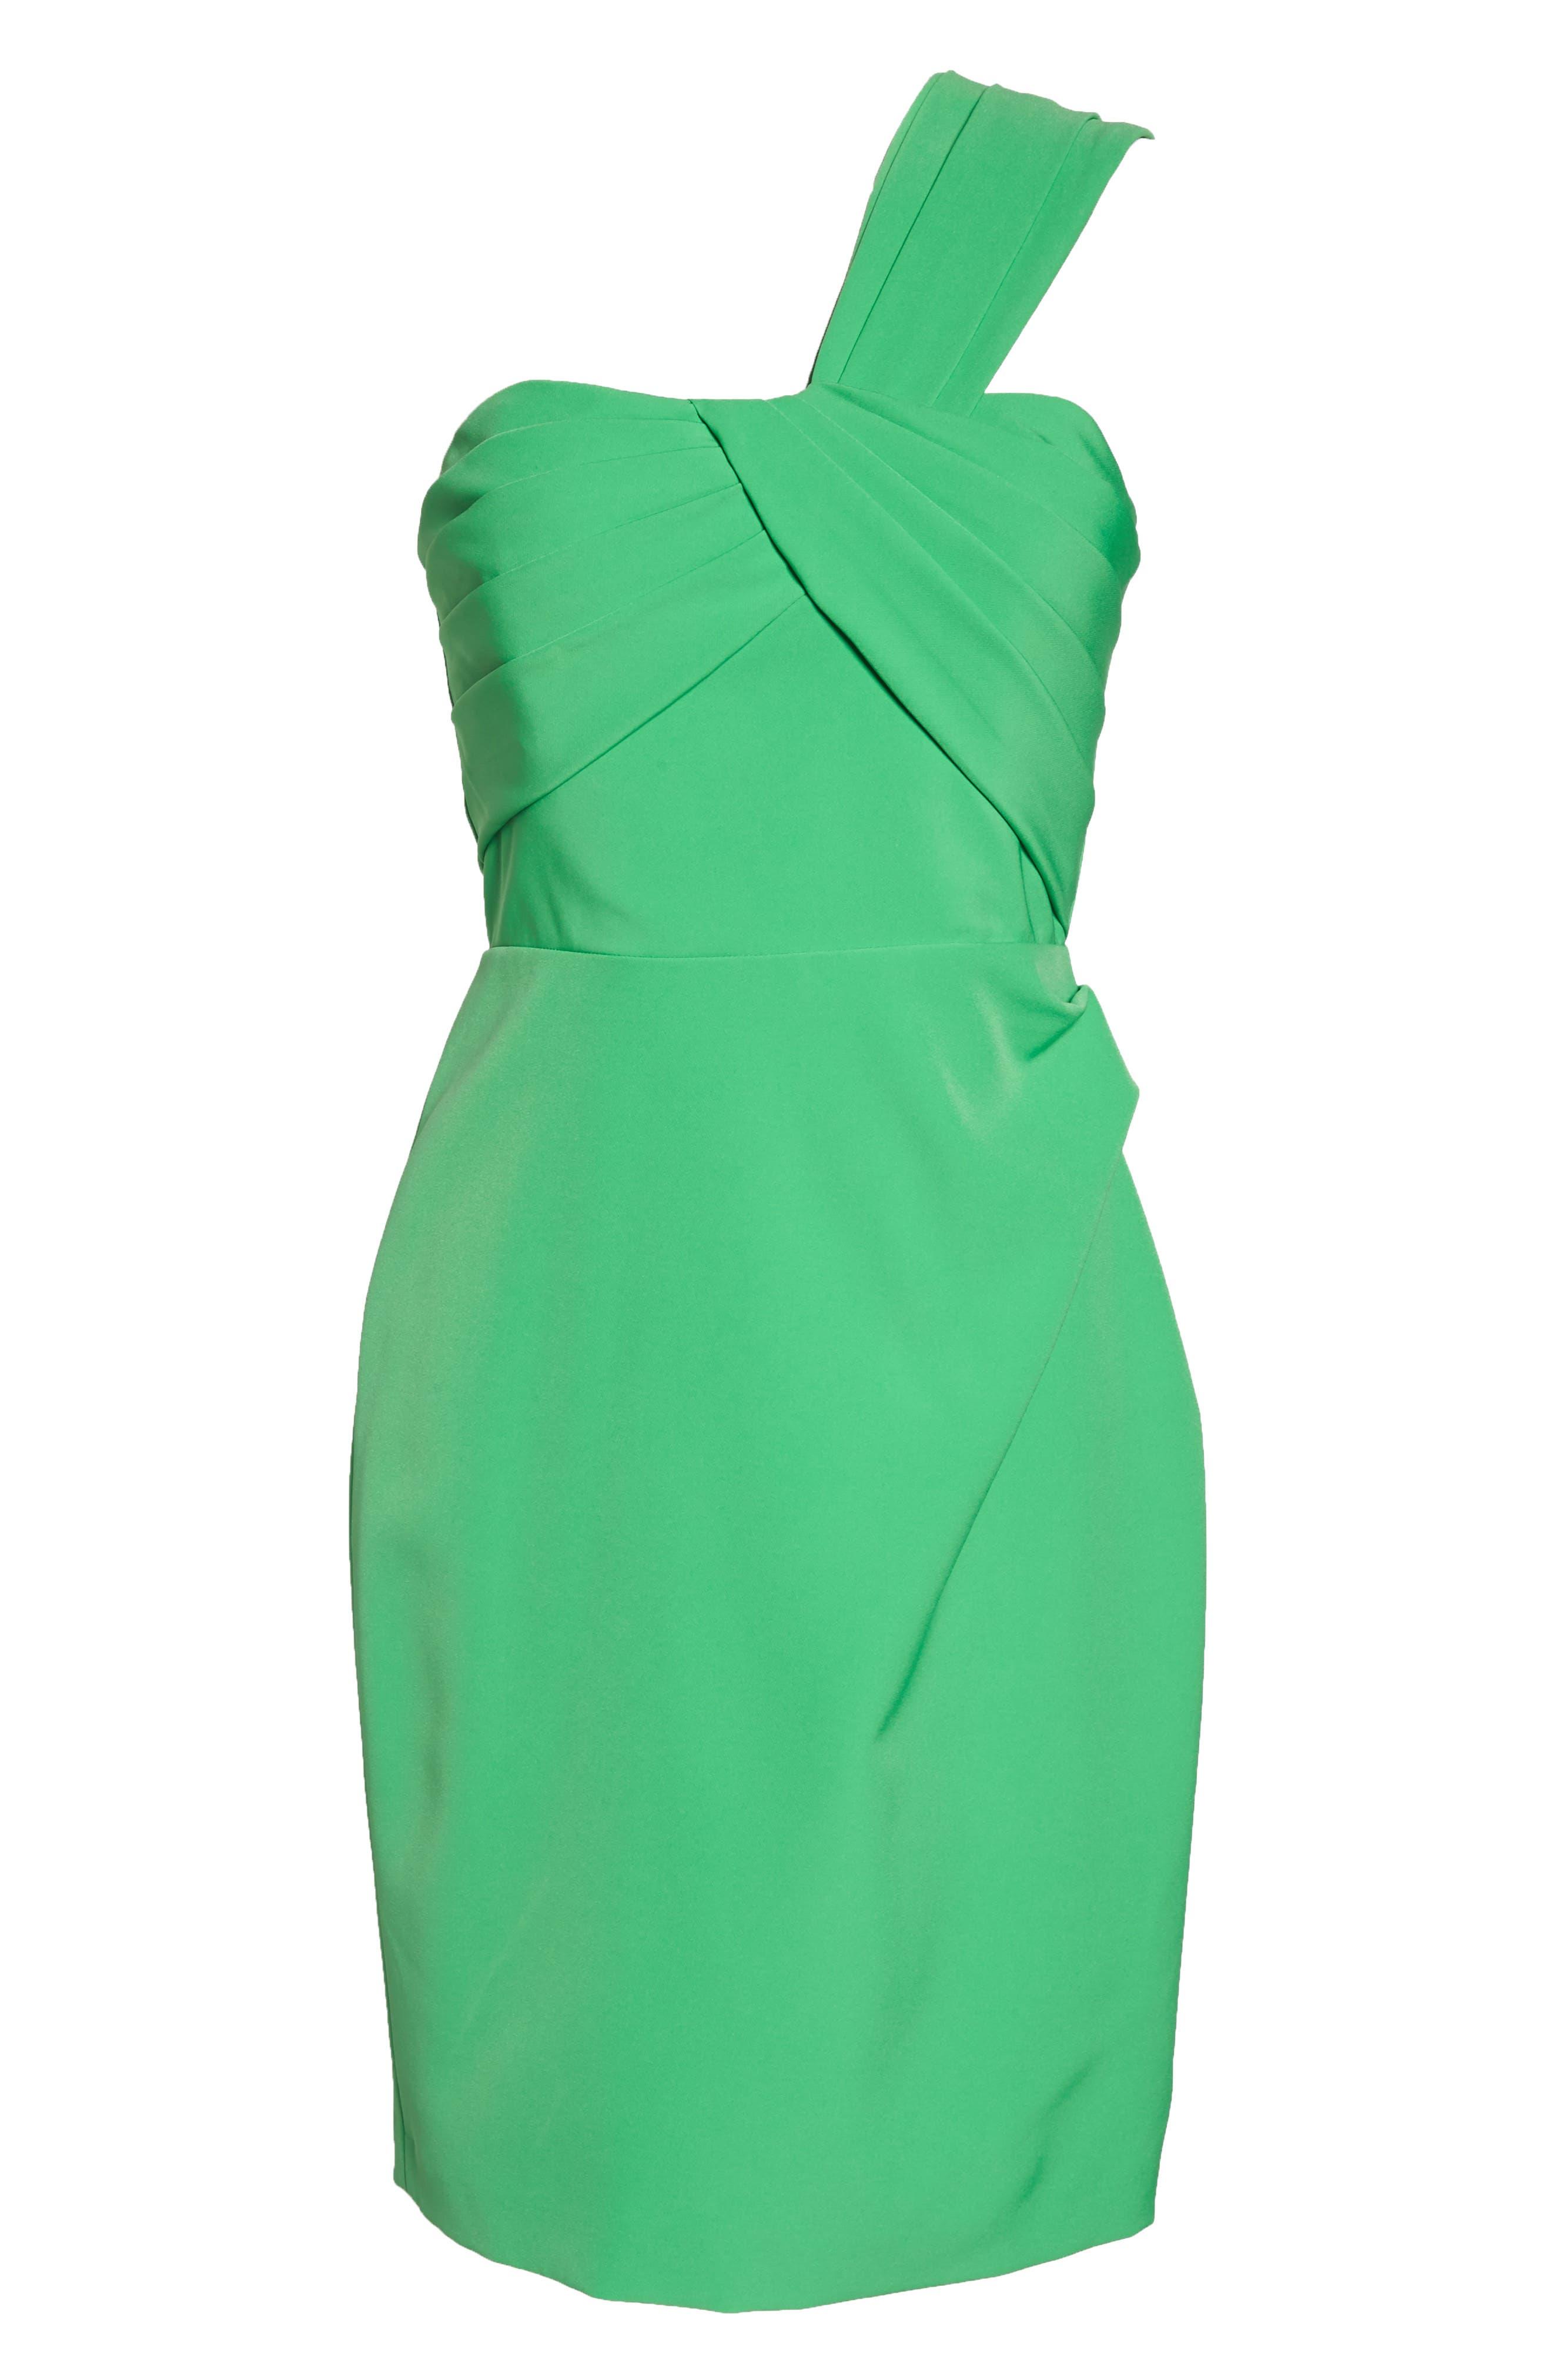 Laguna One-Shoulder Scuba Dress,                             Alternate thumbnail 7, color,                             Green